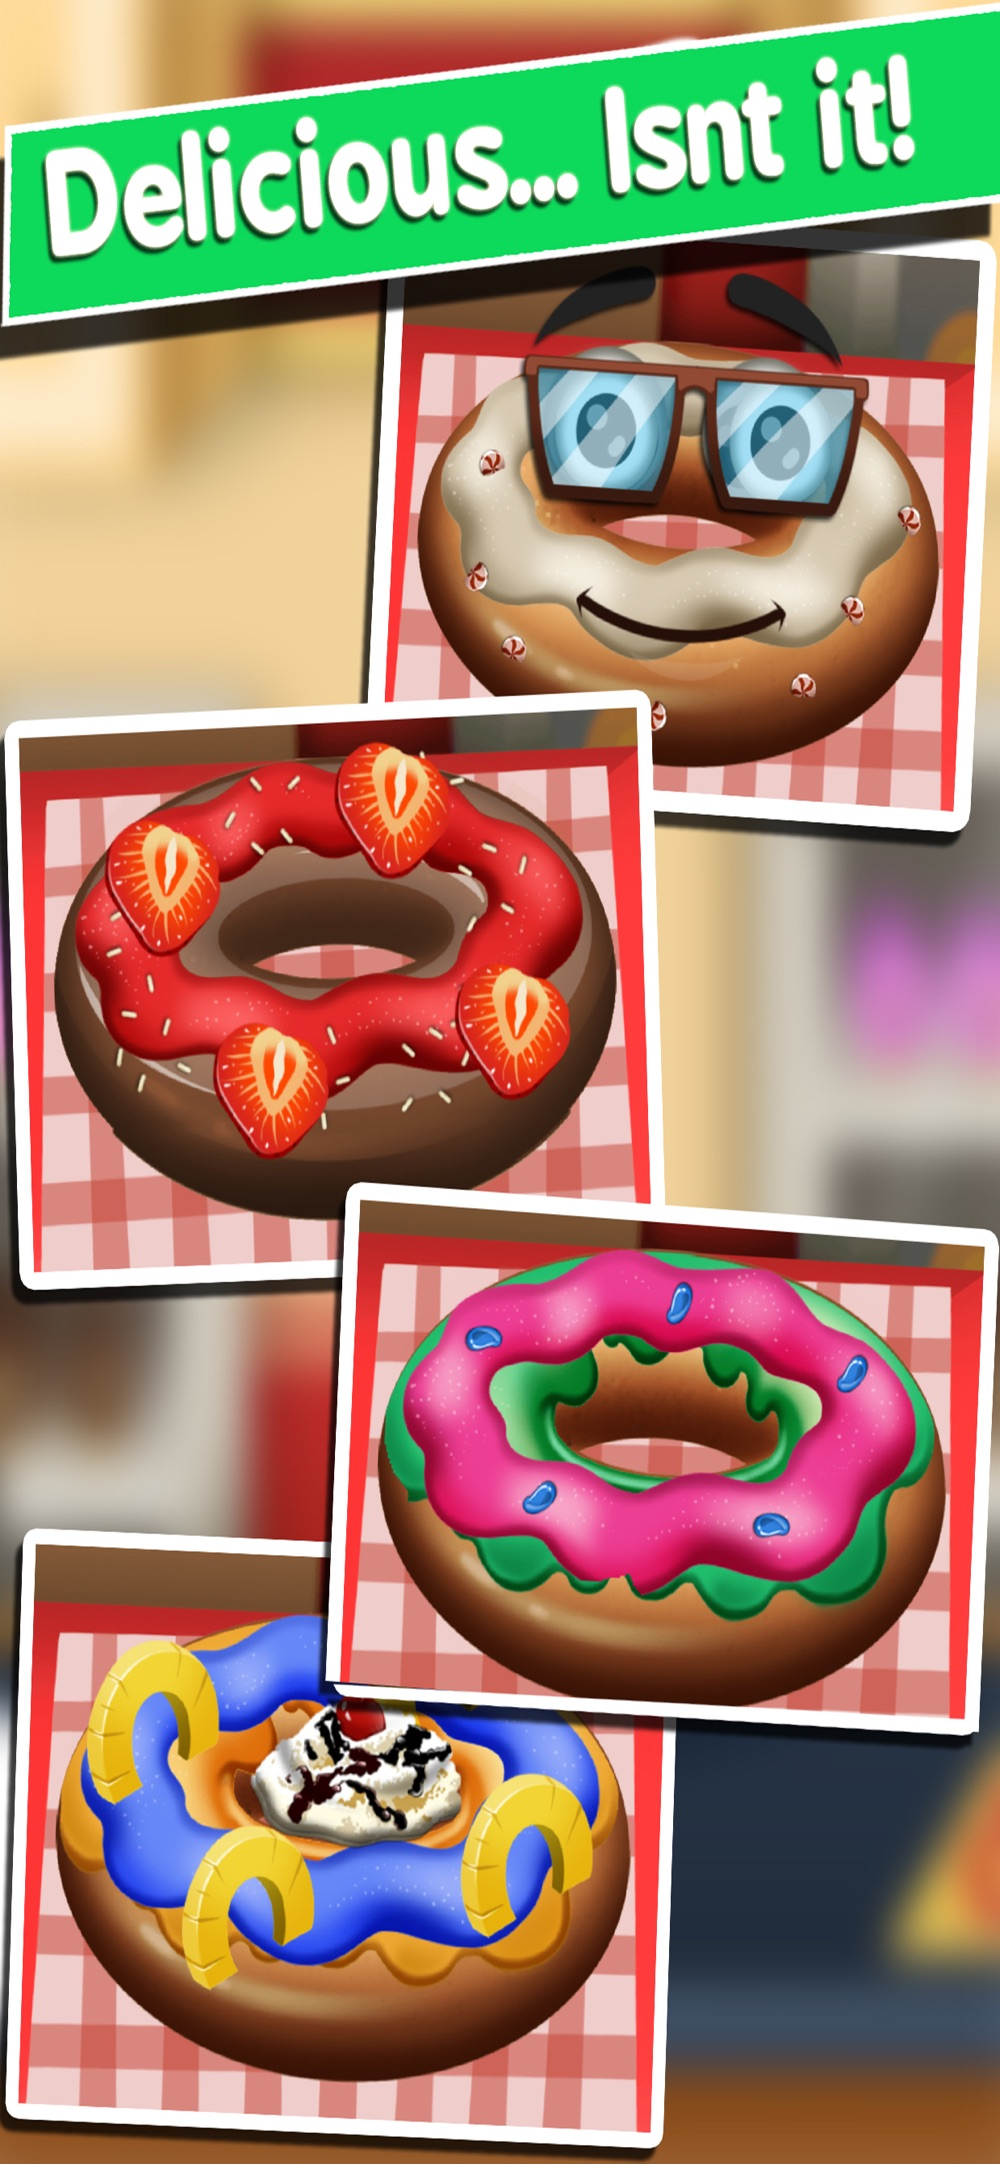 Donut Games hack tool